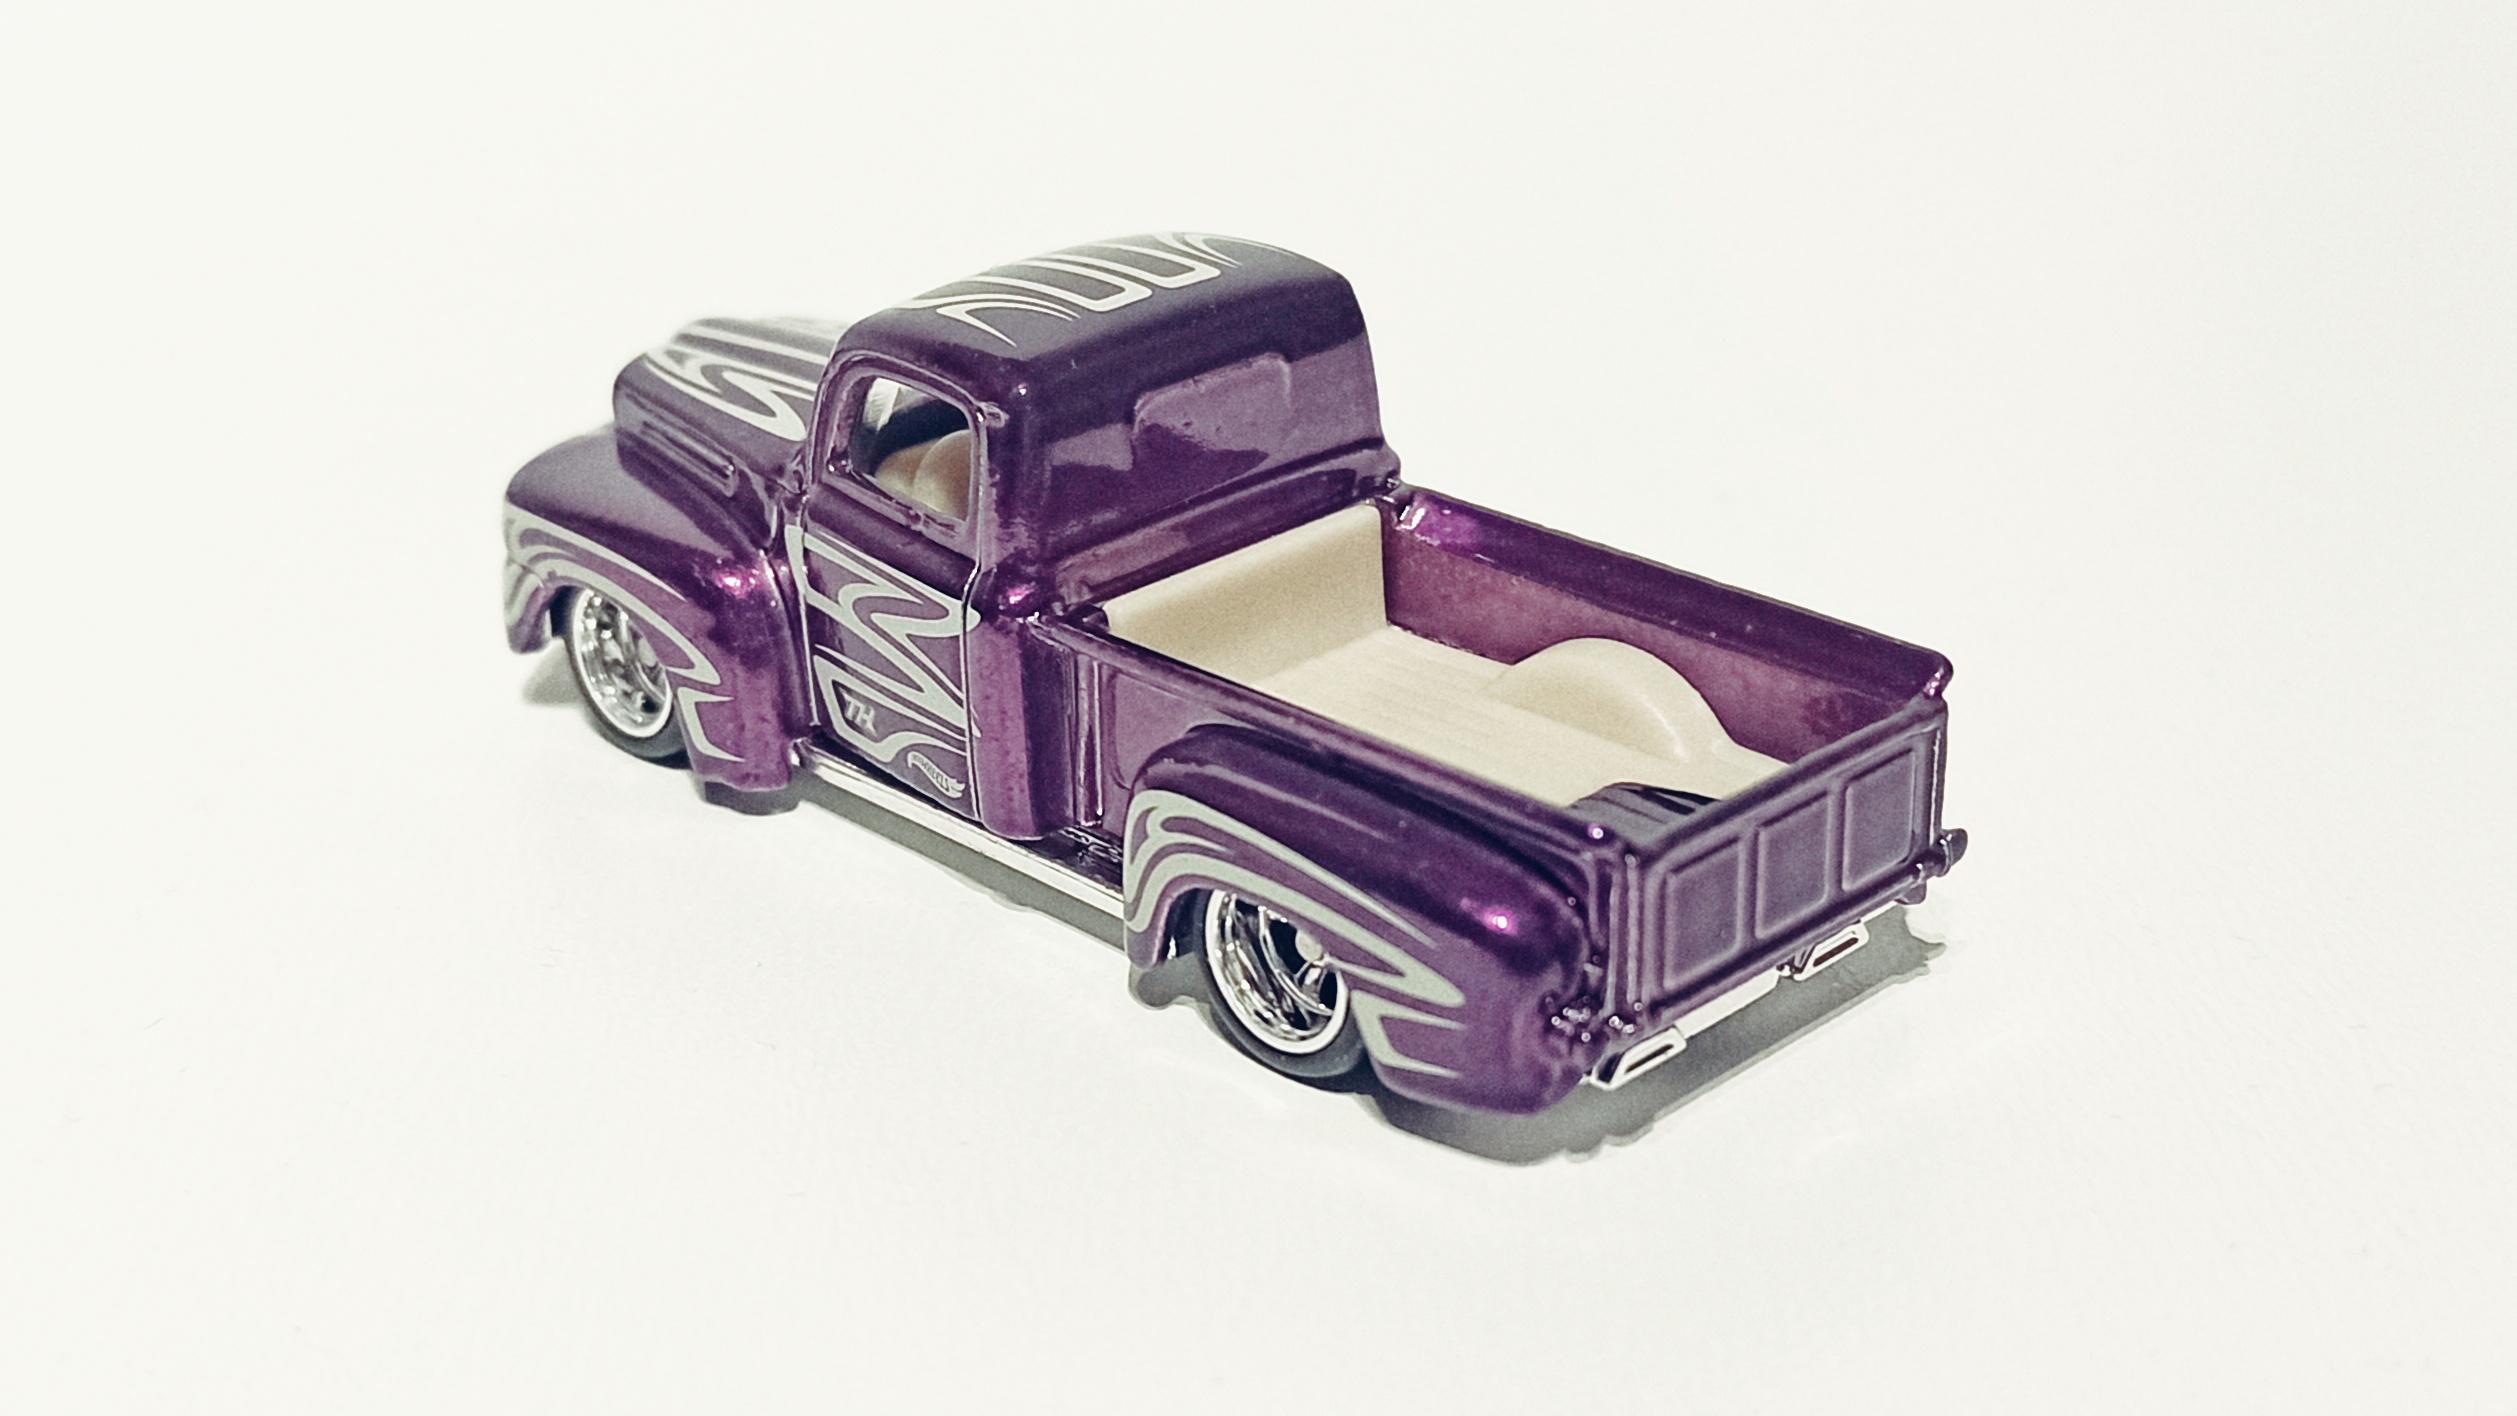 Hot Wheels '49 Ford F1 (GTD03) 2021 (225/250) HW Hot Trucks (6/10) spectraflame purple Super Treasure Hunt (STH) top angle